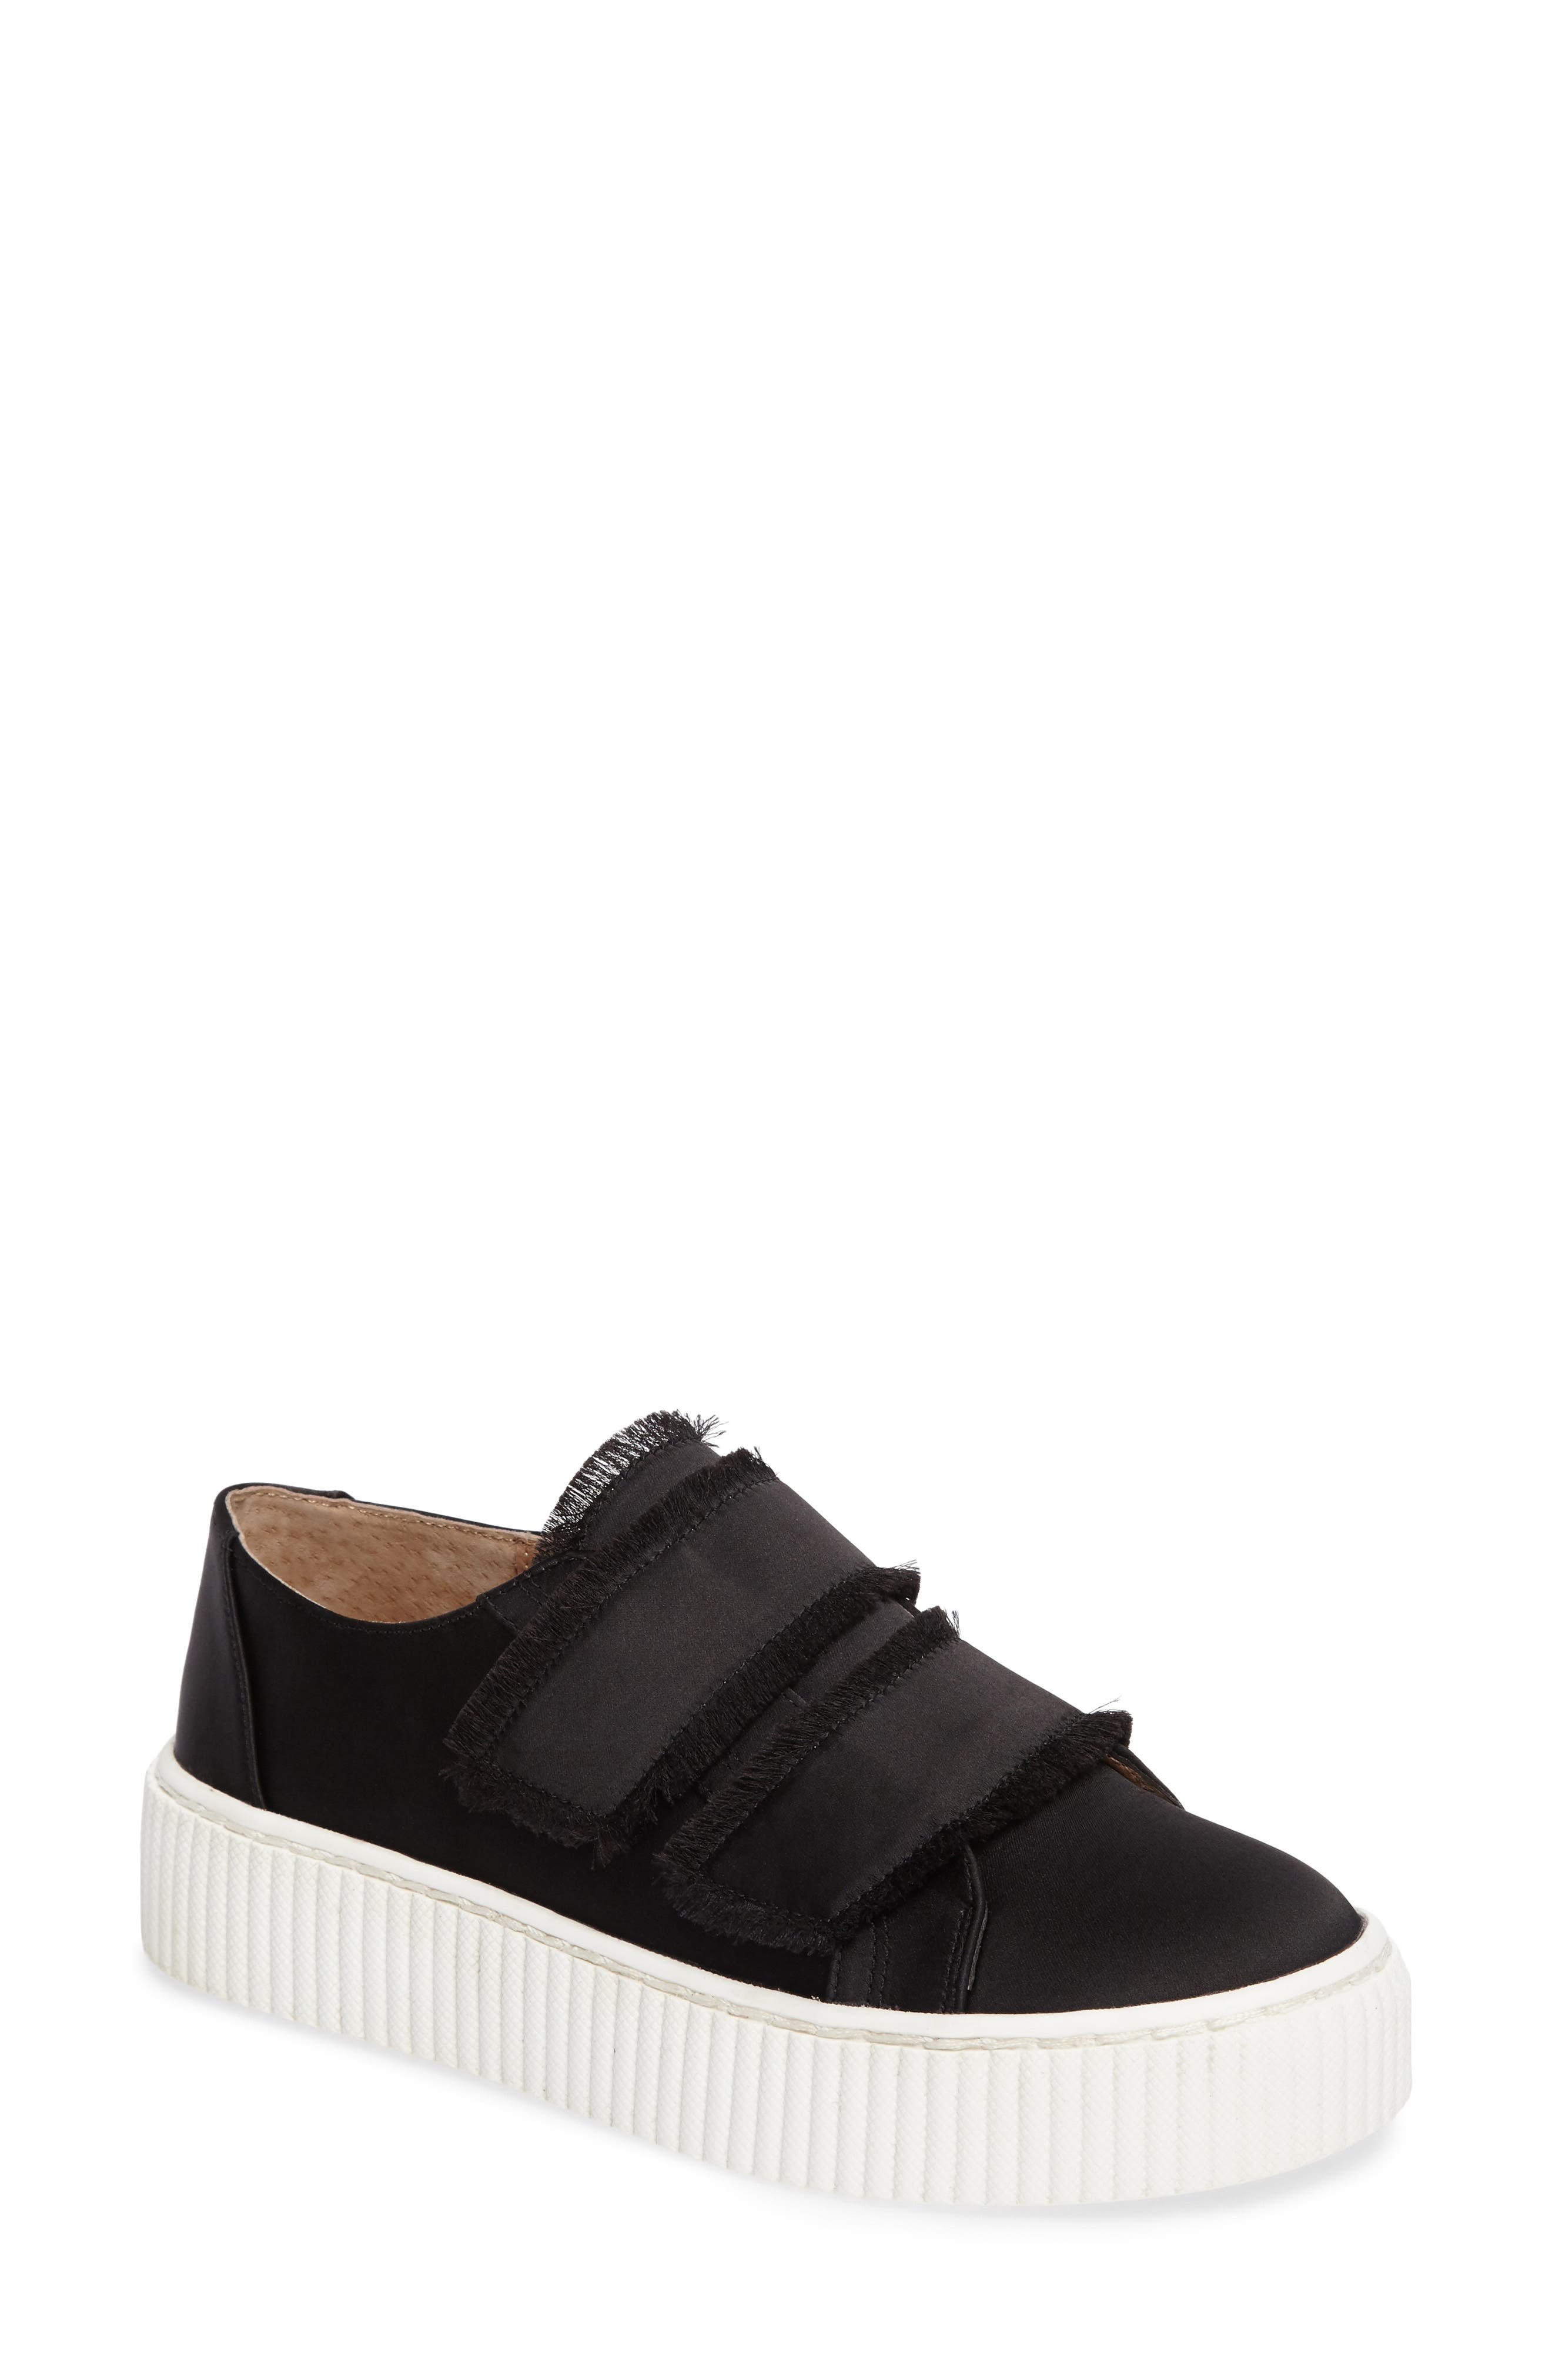 Elder Fringed Platform Sneaker,                             Main thumbnail 1, color,                             Black